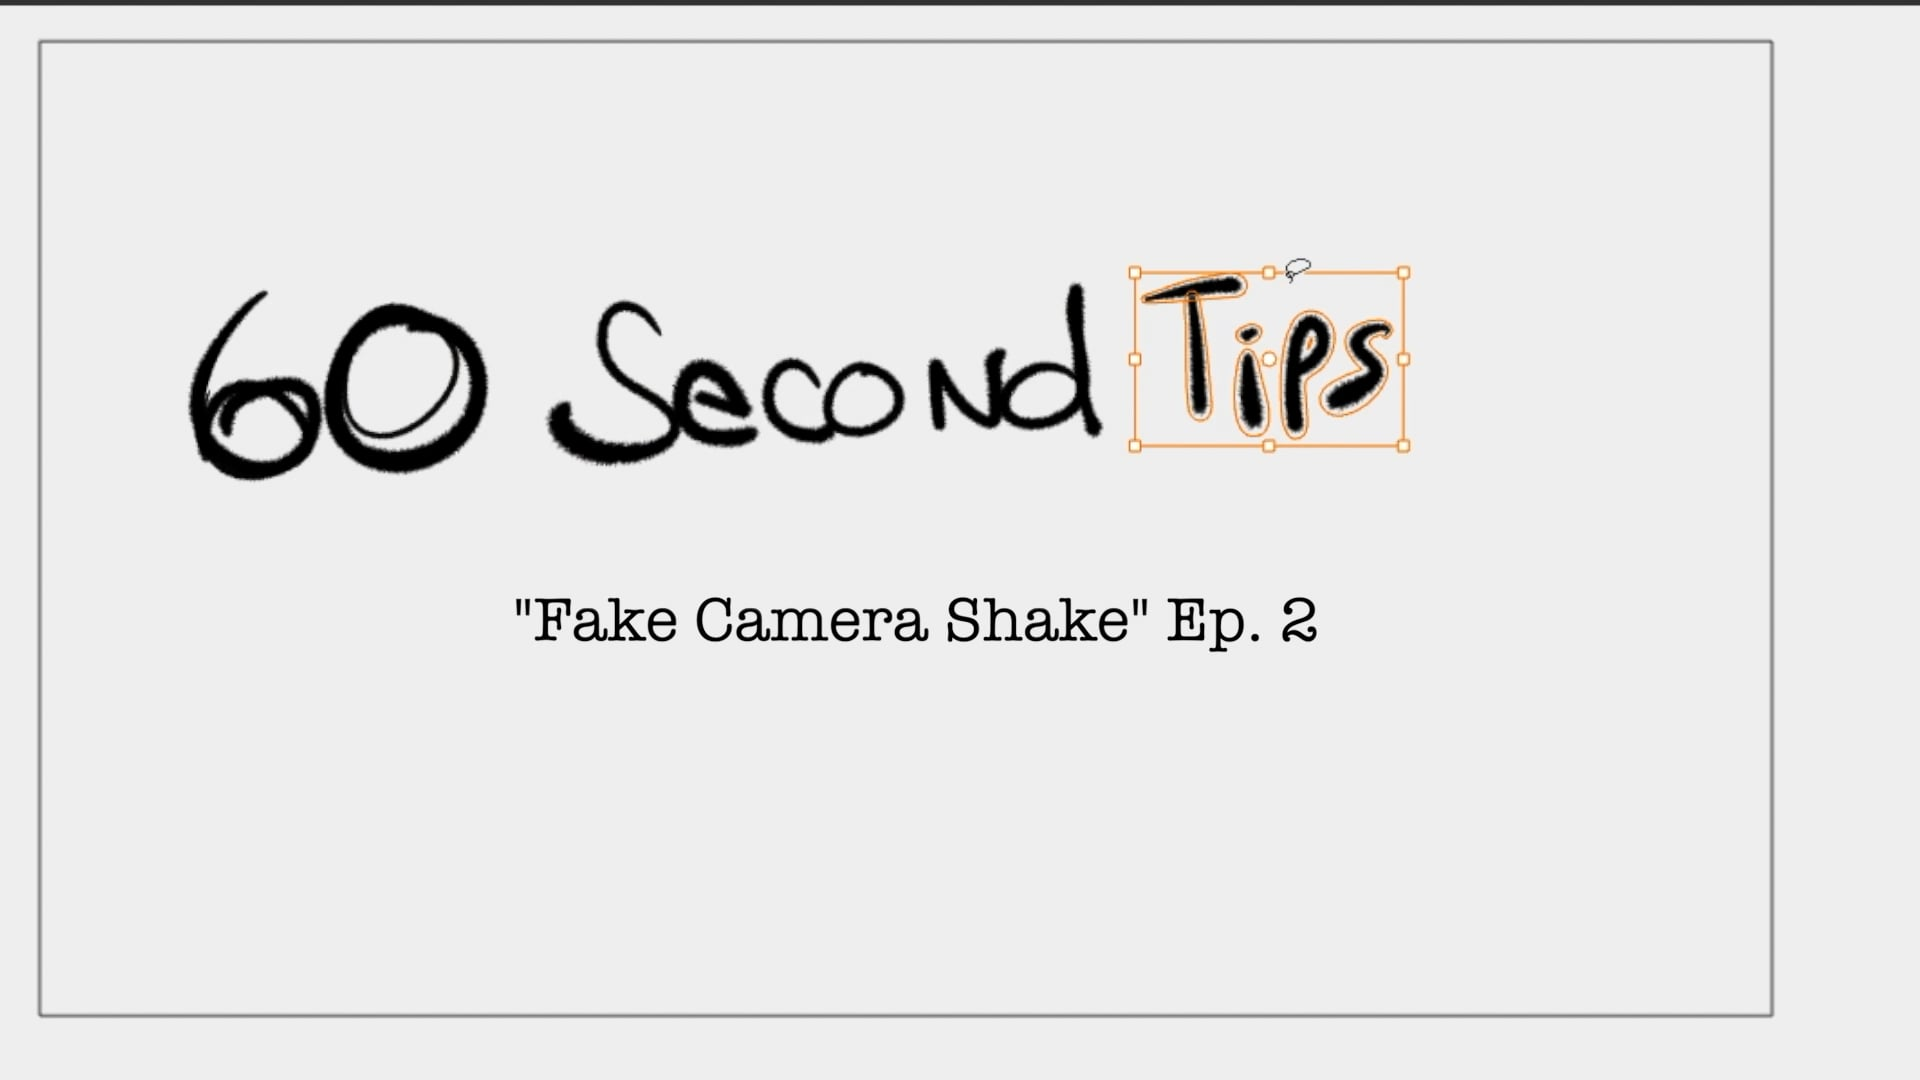 Ep 2 - Camera Shake